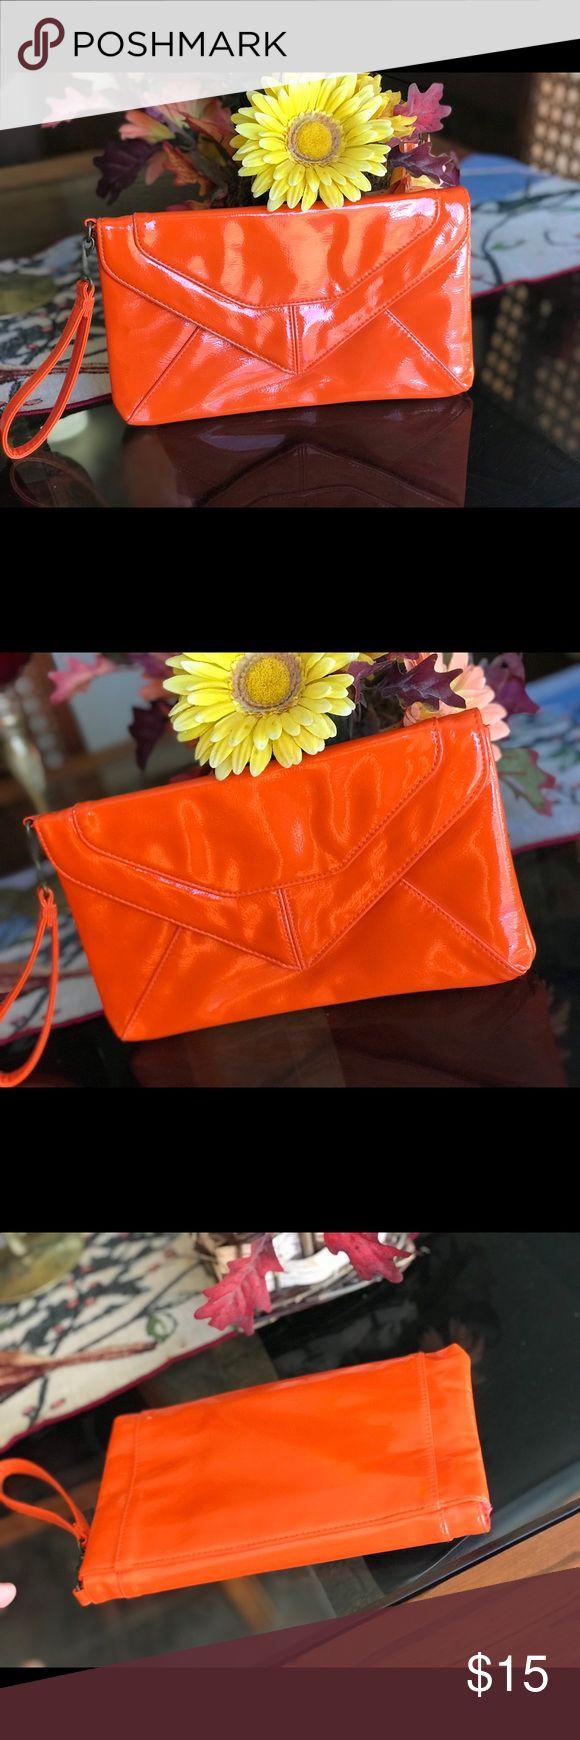 🎉SALE🎉NWT Envelope Clutch Bag Orange envelope Clutch bag -New,never used! Size:10X6 Bags